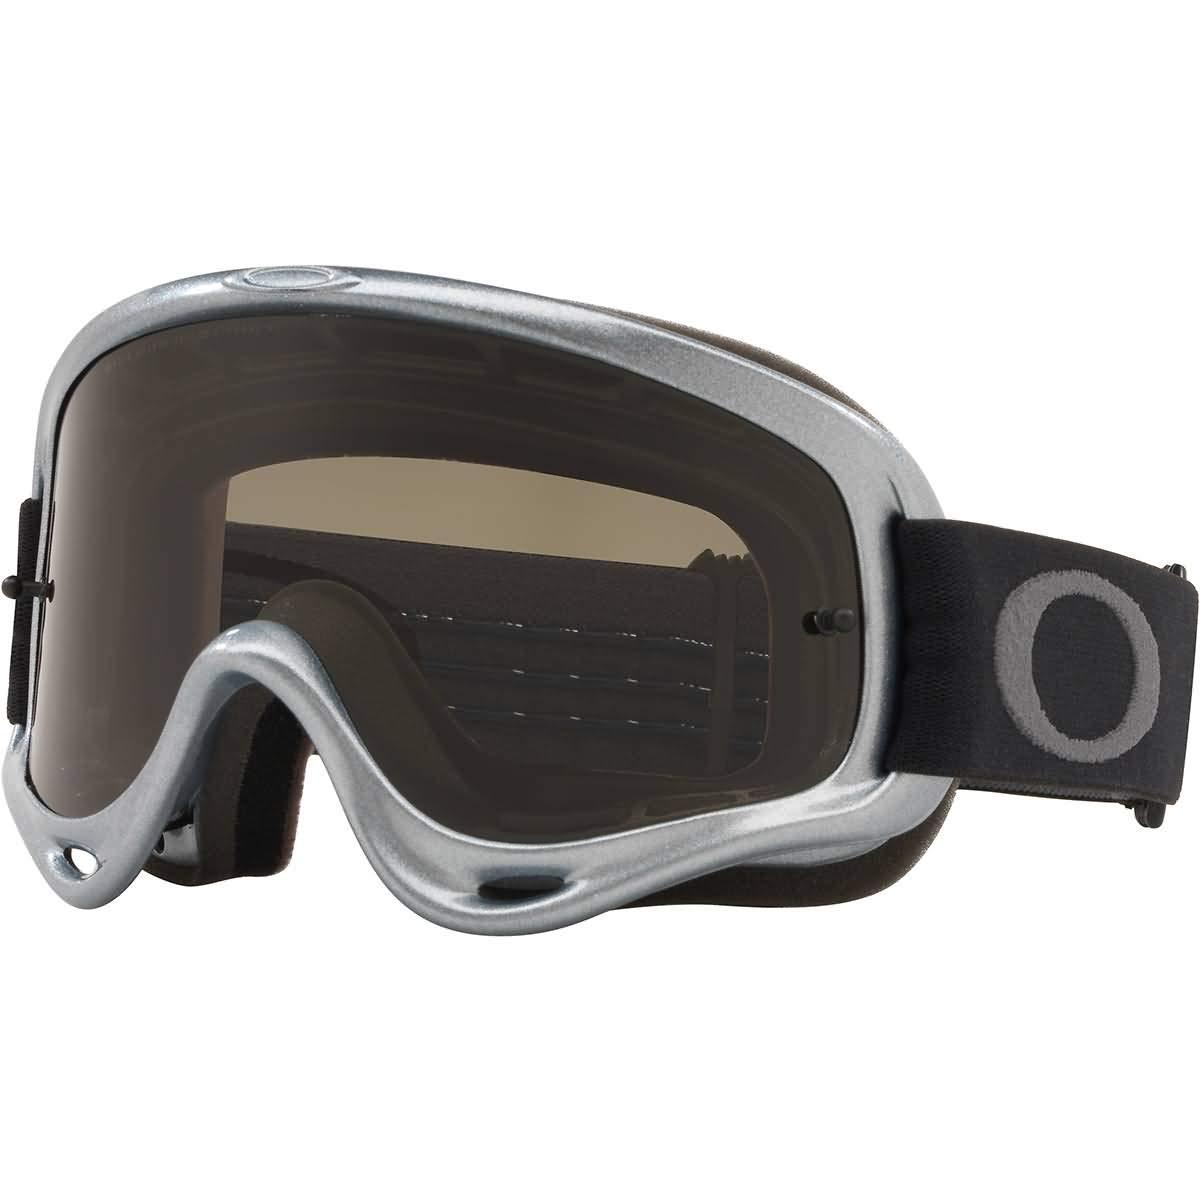 f0878009b83 Amazon.com  Oakley O-Frame with Clear Lens included MX Goggles O-Frame Sand  MX   Clear AF Lens (Jet Black Grey